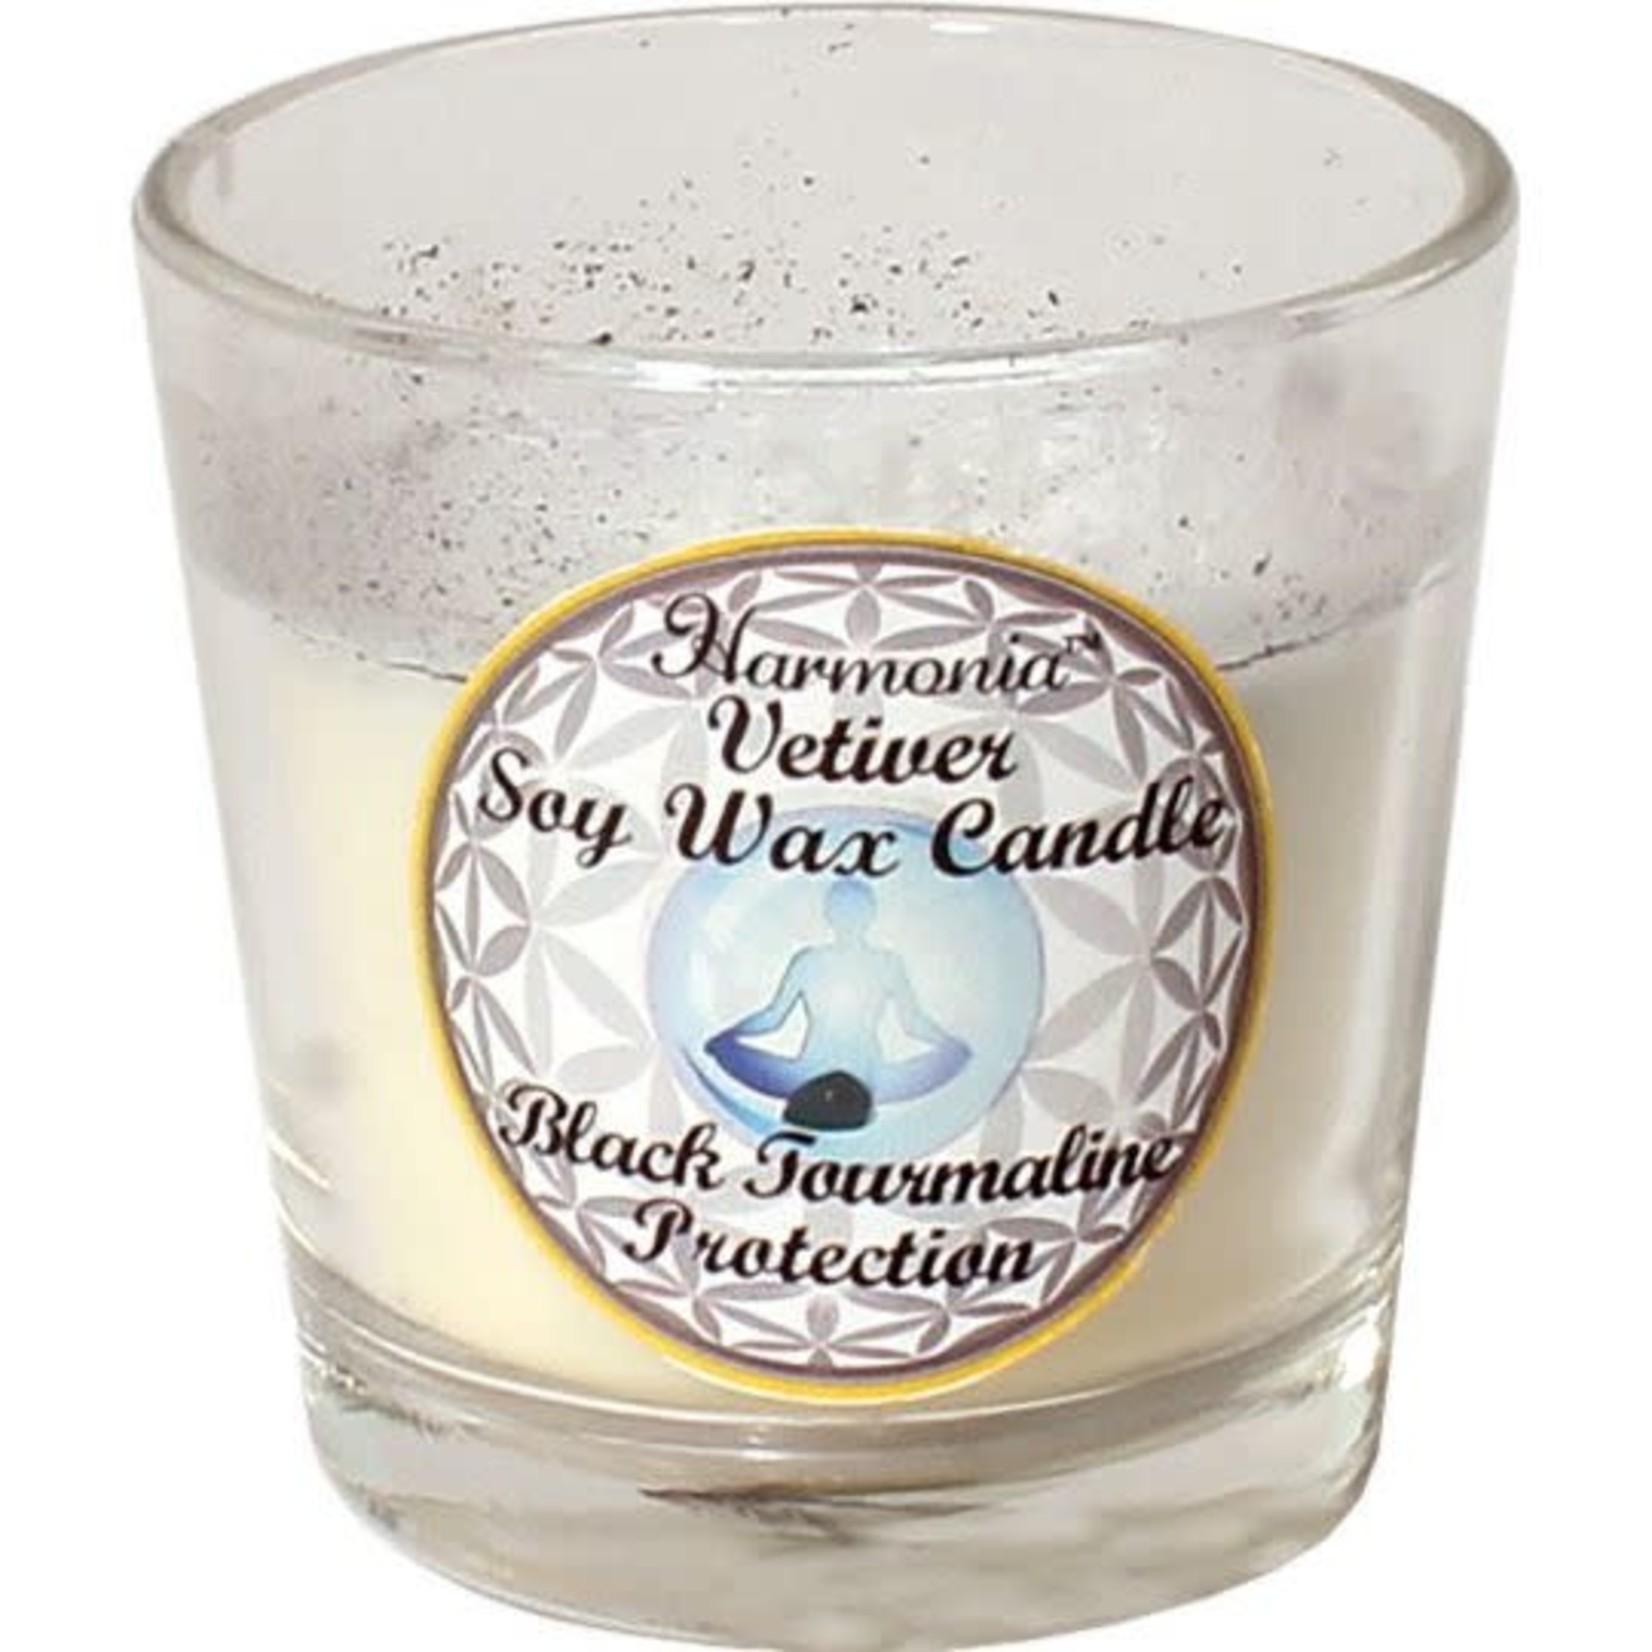 Harmonia - Vetiver  Black Tourmaline Soy Wax Candle